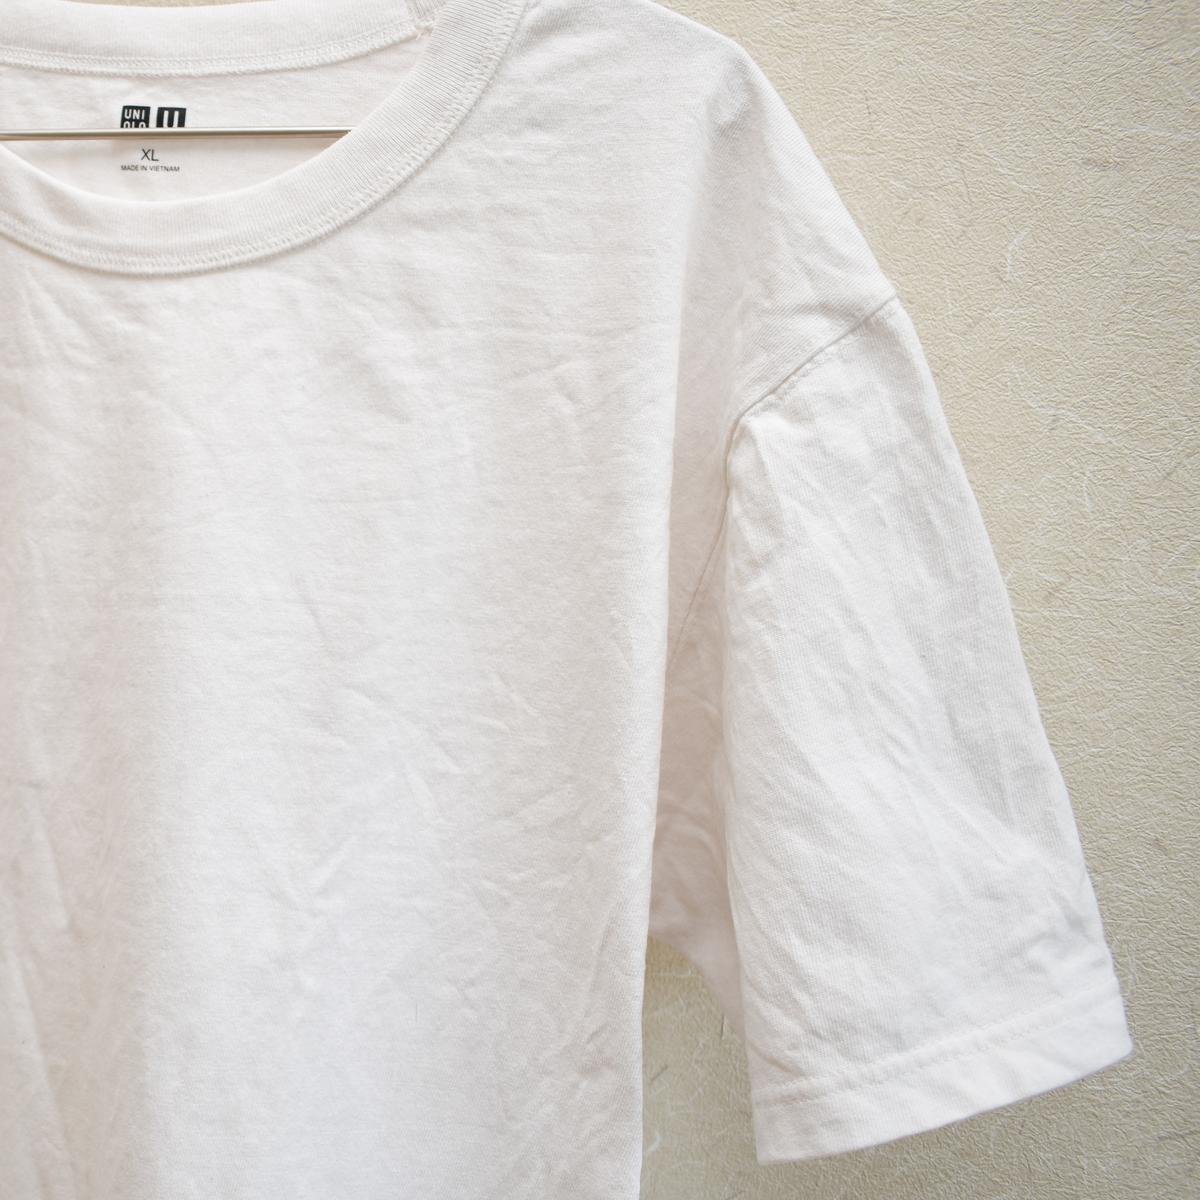 f:id:yamada0221:20190530110105j:plain